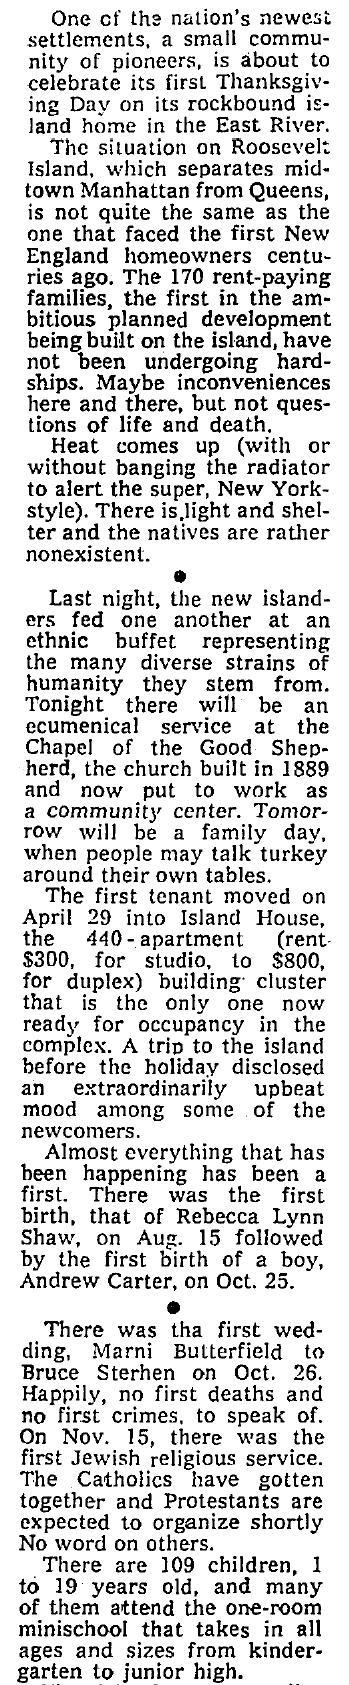 Thanksgiving 1975 - Partial